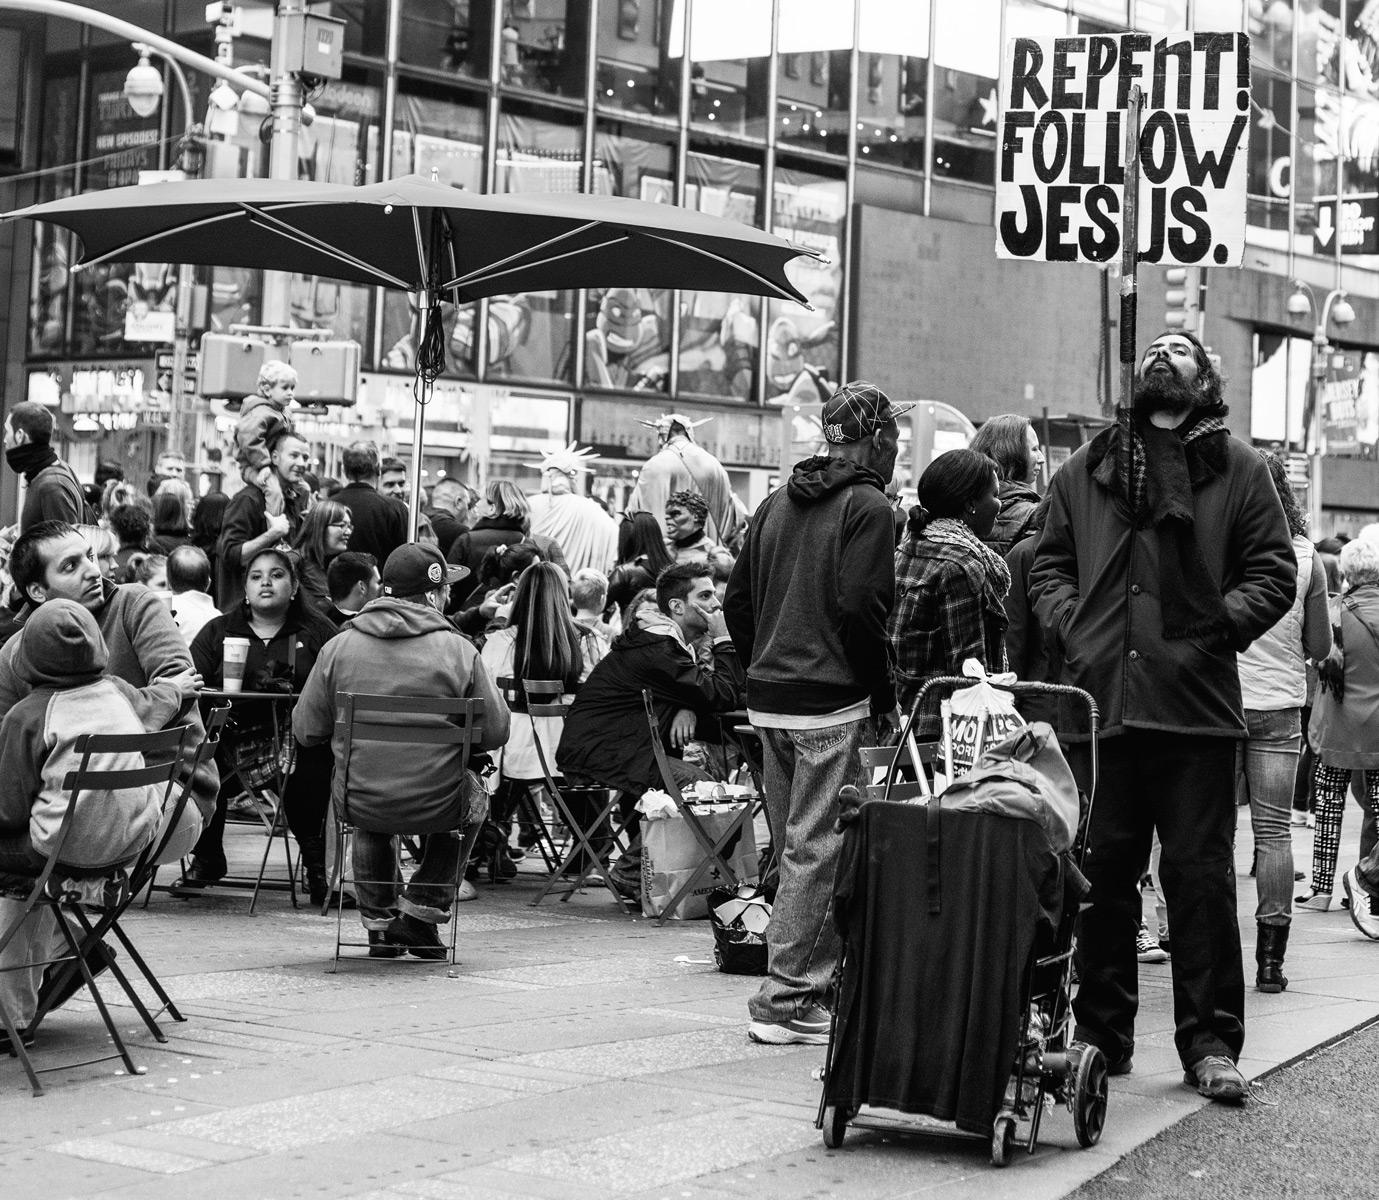 Repent! Follow Jesus.  NYC, October 2014